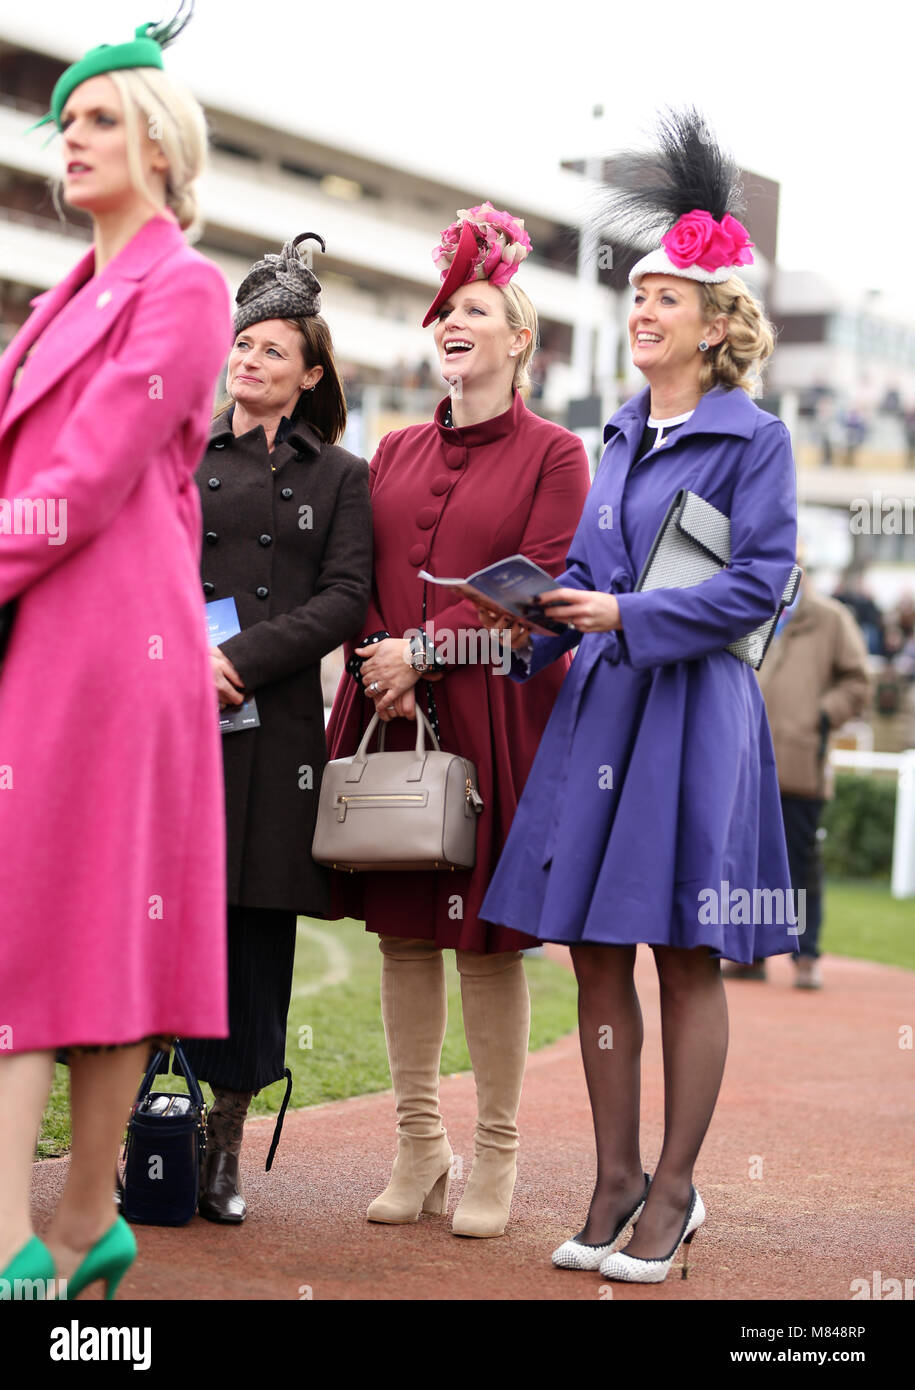 1e3e51fa2 Zara Tindall (centre) during Ladies Day of the 2018 Cheltenham Stock ...